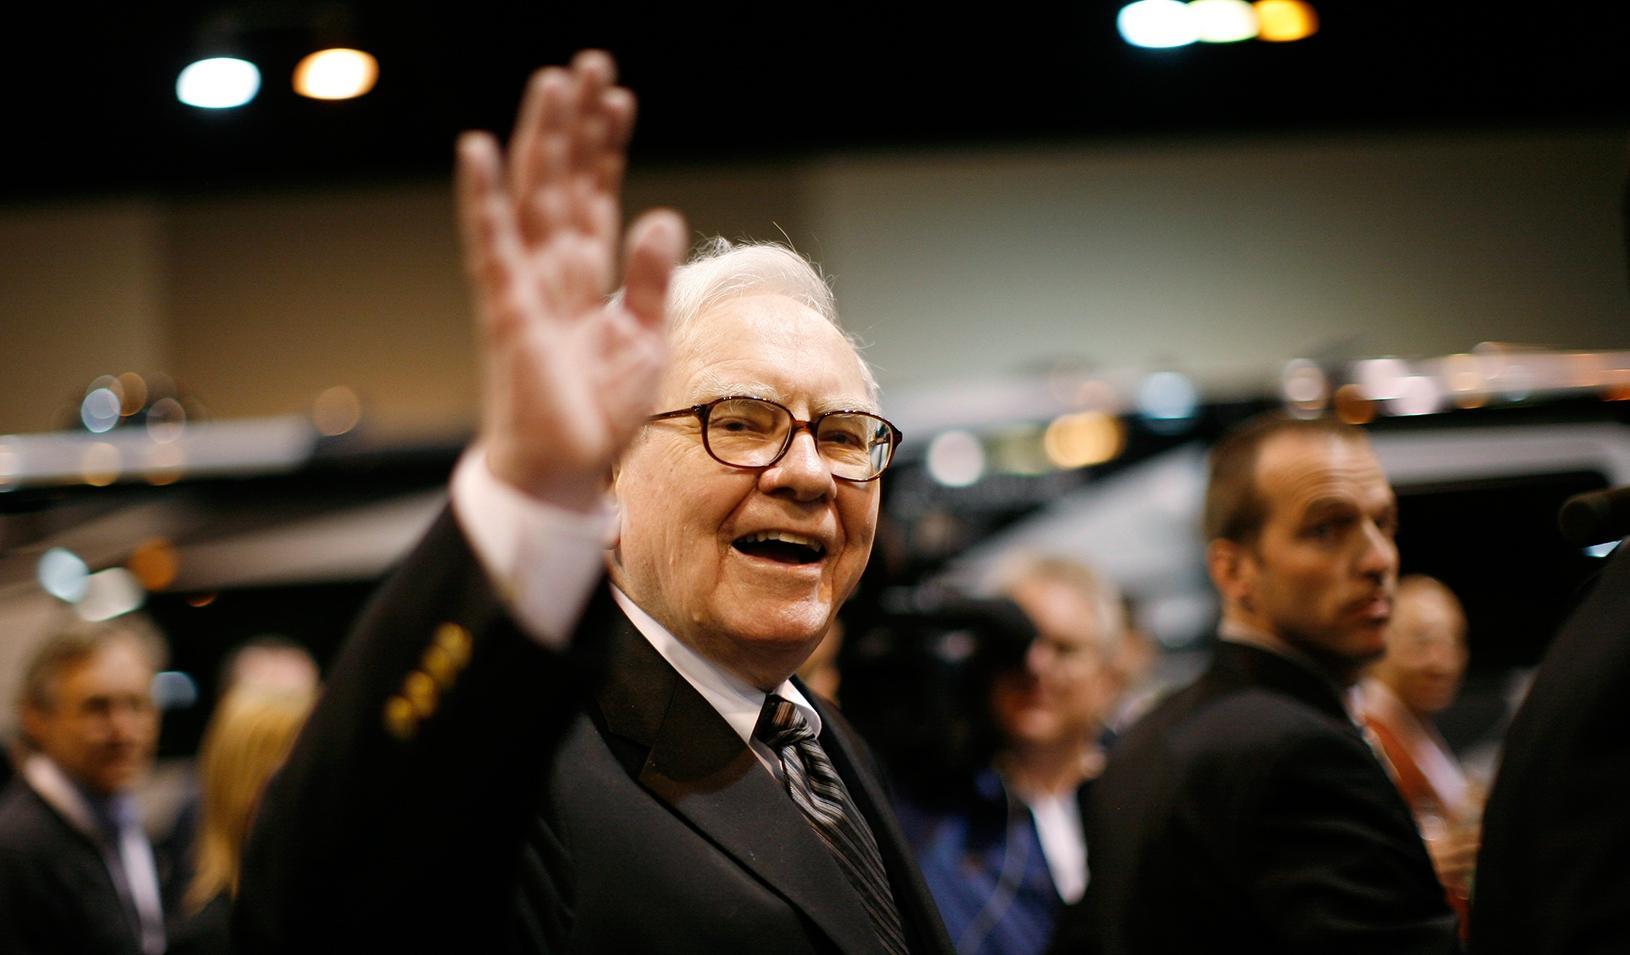 About Warren Buffett's $377 Million Real Estate Investment